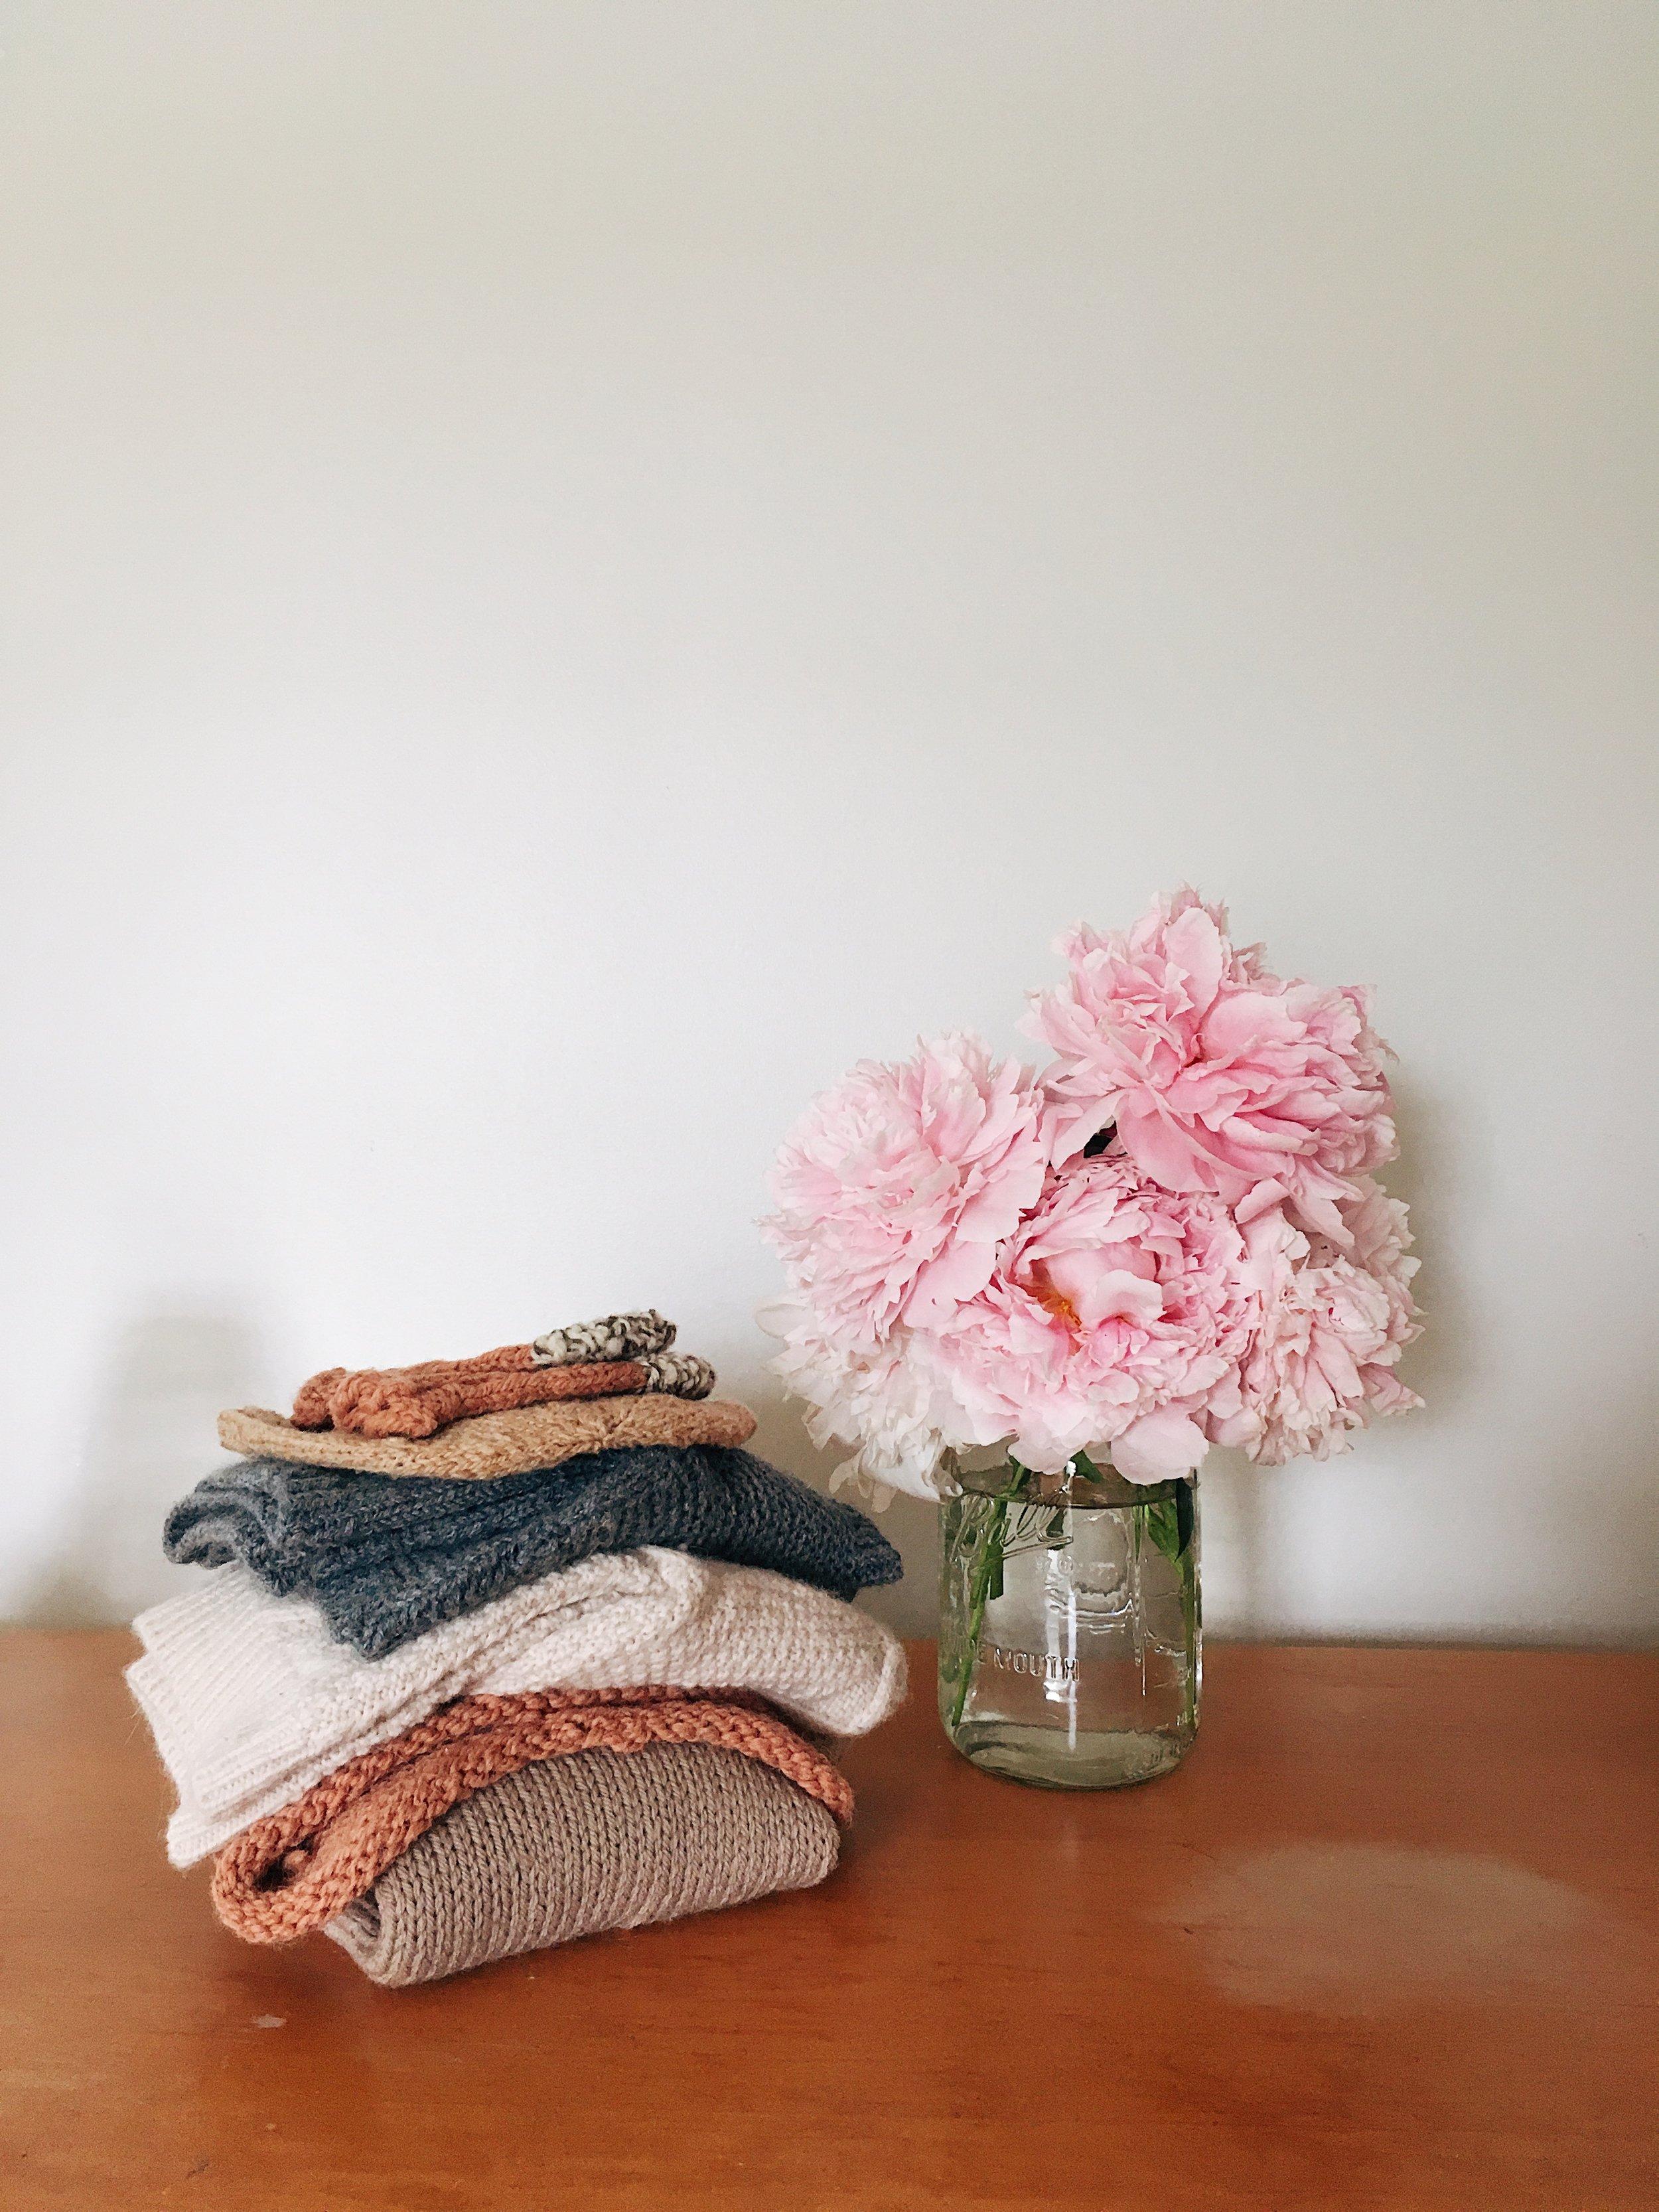 handmade wardrobe knitting hand knits by samantha spigos